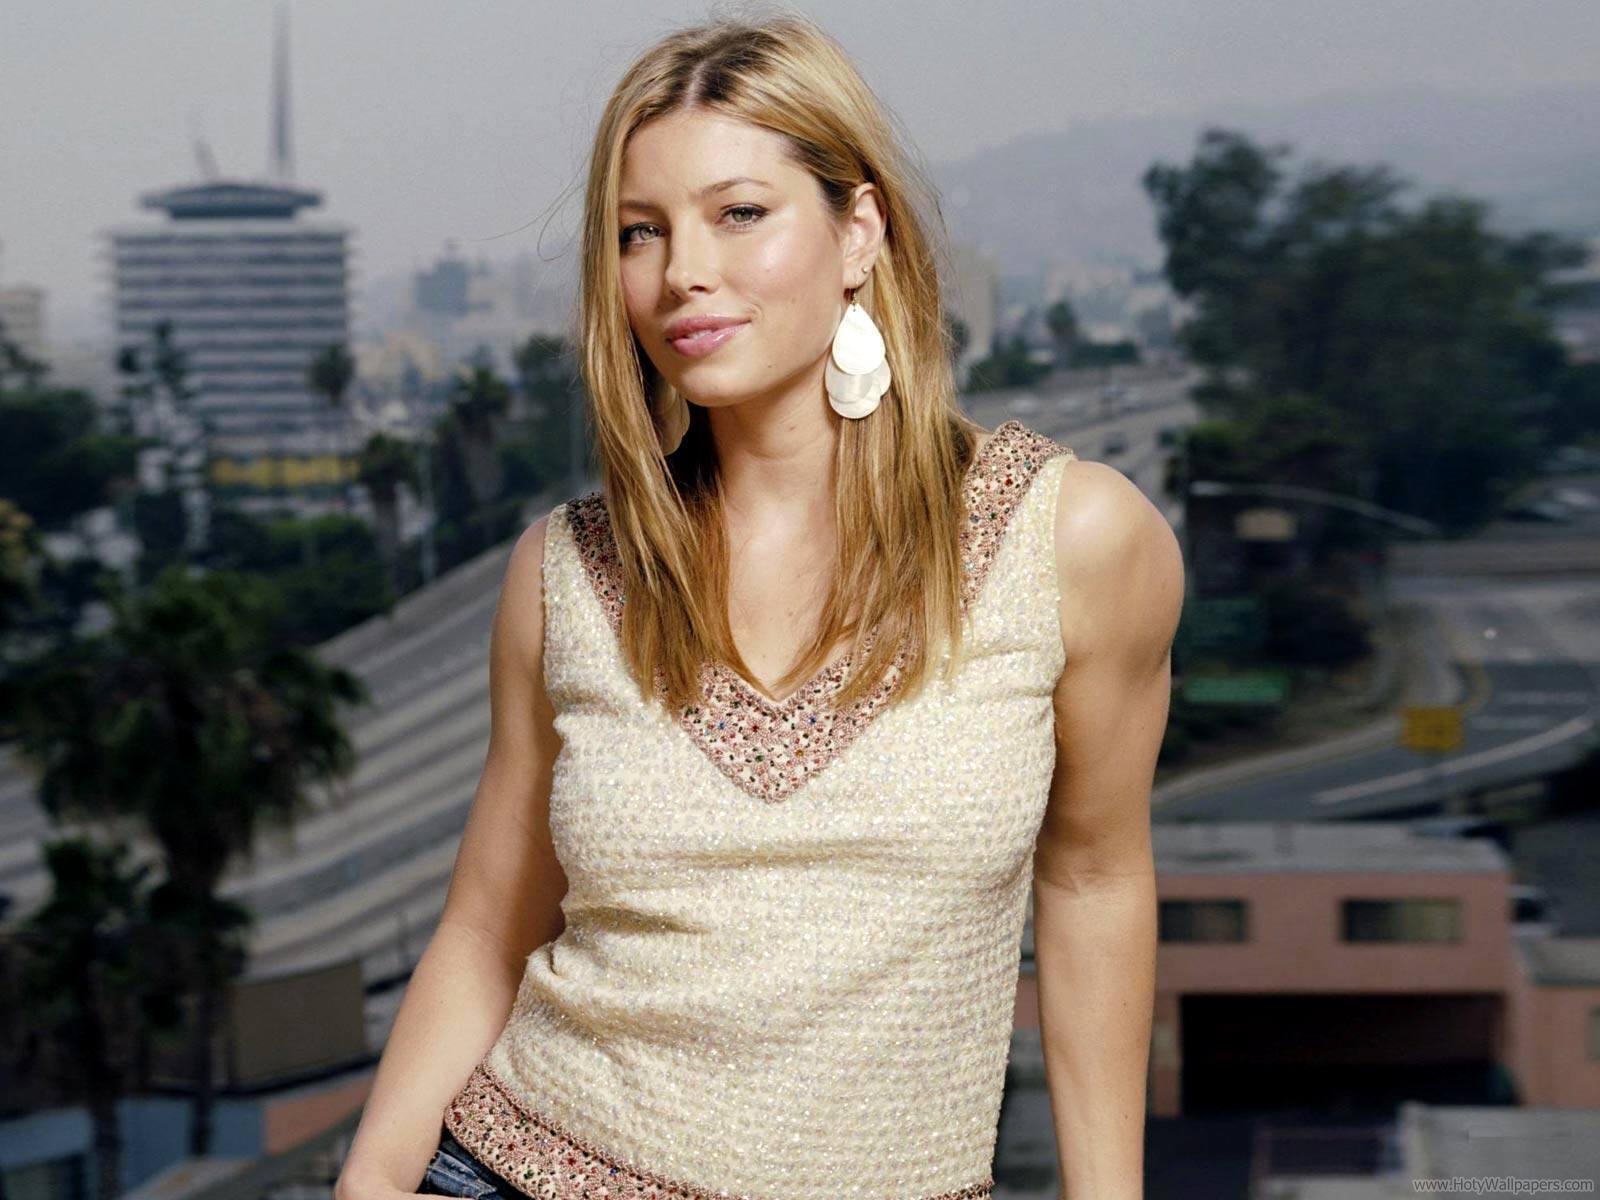 http://1.bp.blogspot.com/-VTB2E5Wci4o/TrVpY3LyqiI/AAAAAAAAPbA/HYWNYlwIt8I/s1600/american_actress_jessica_biel_wallpaper.jpg